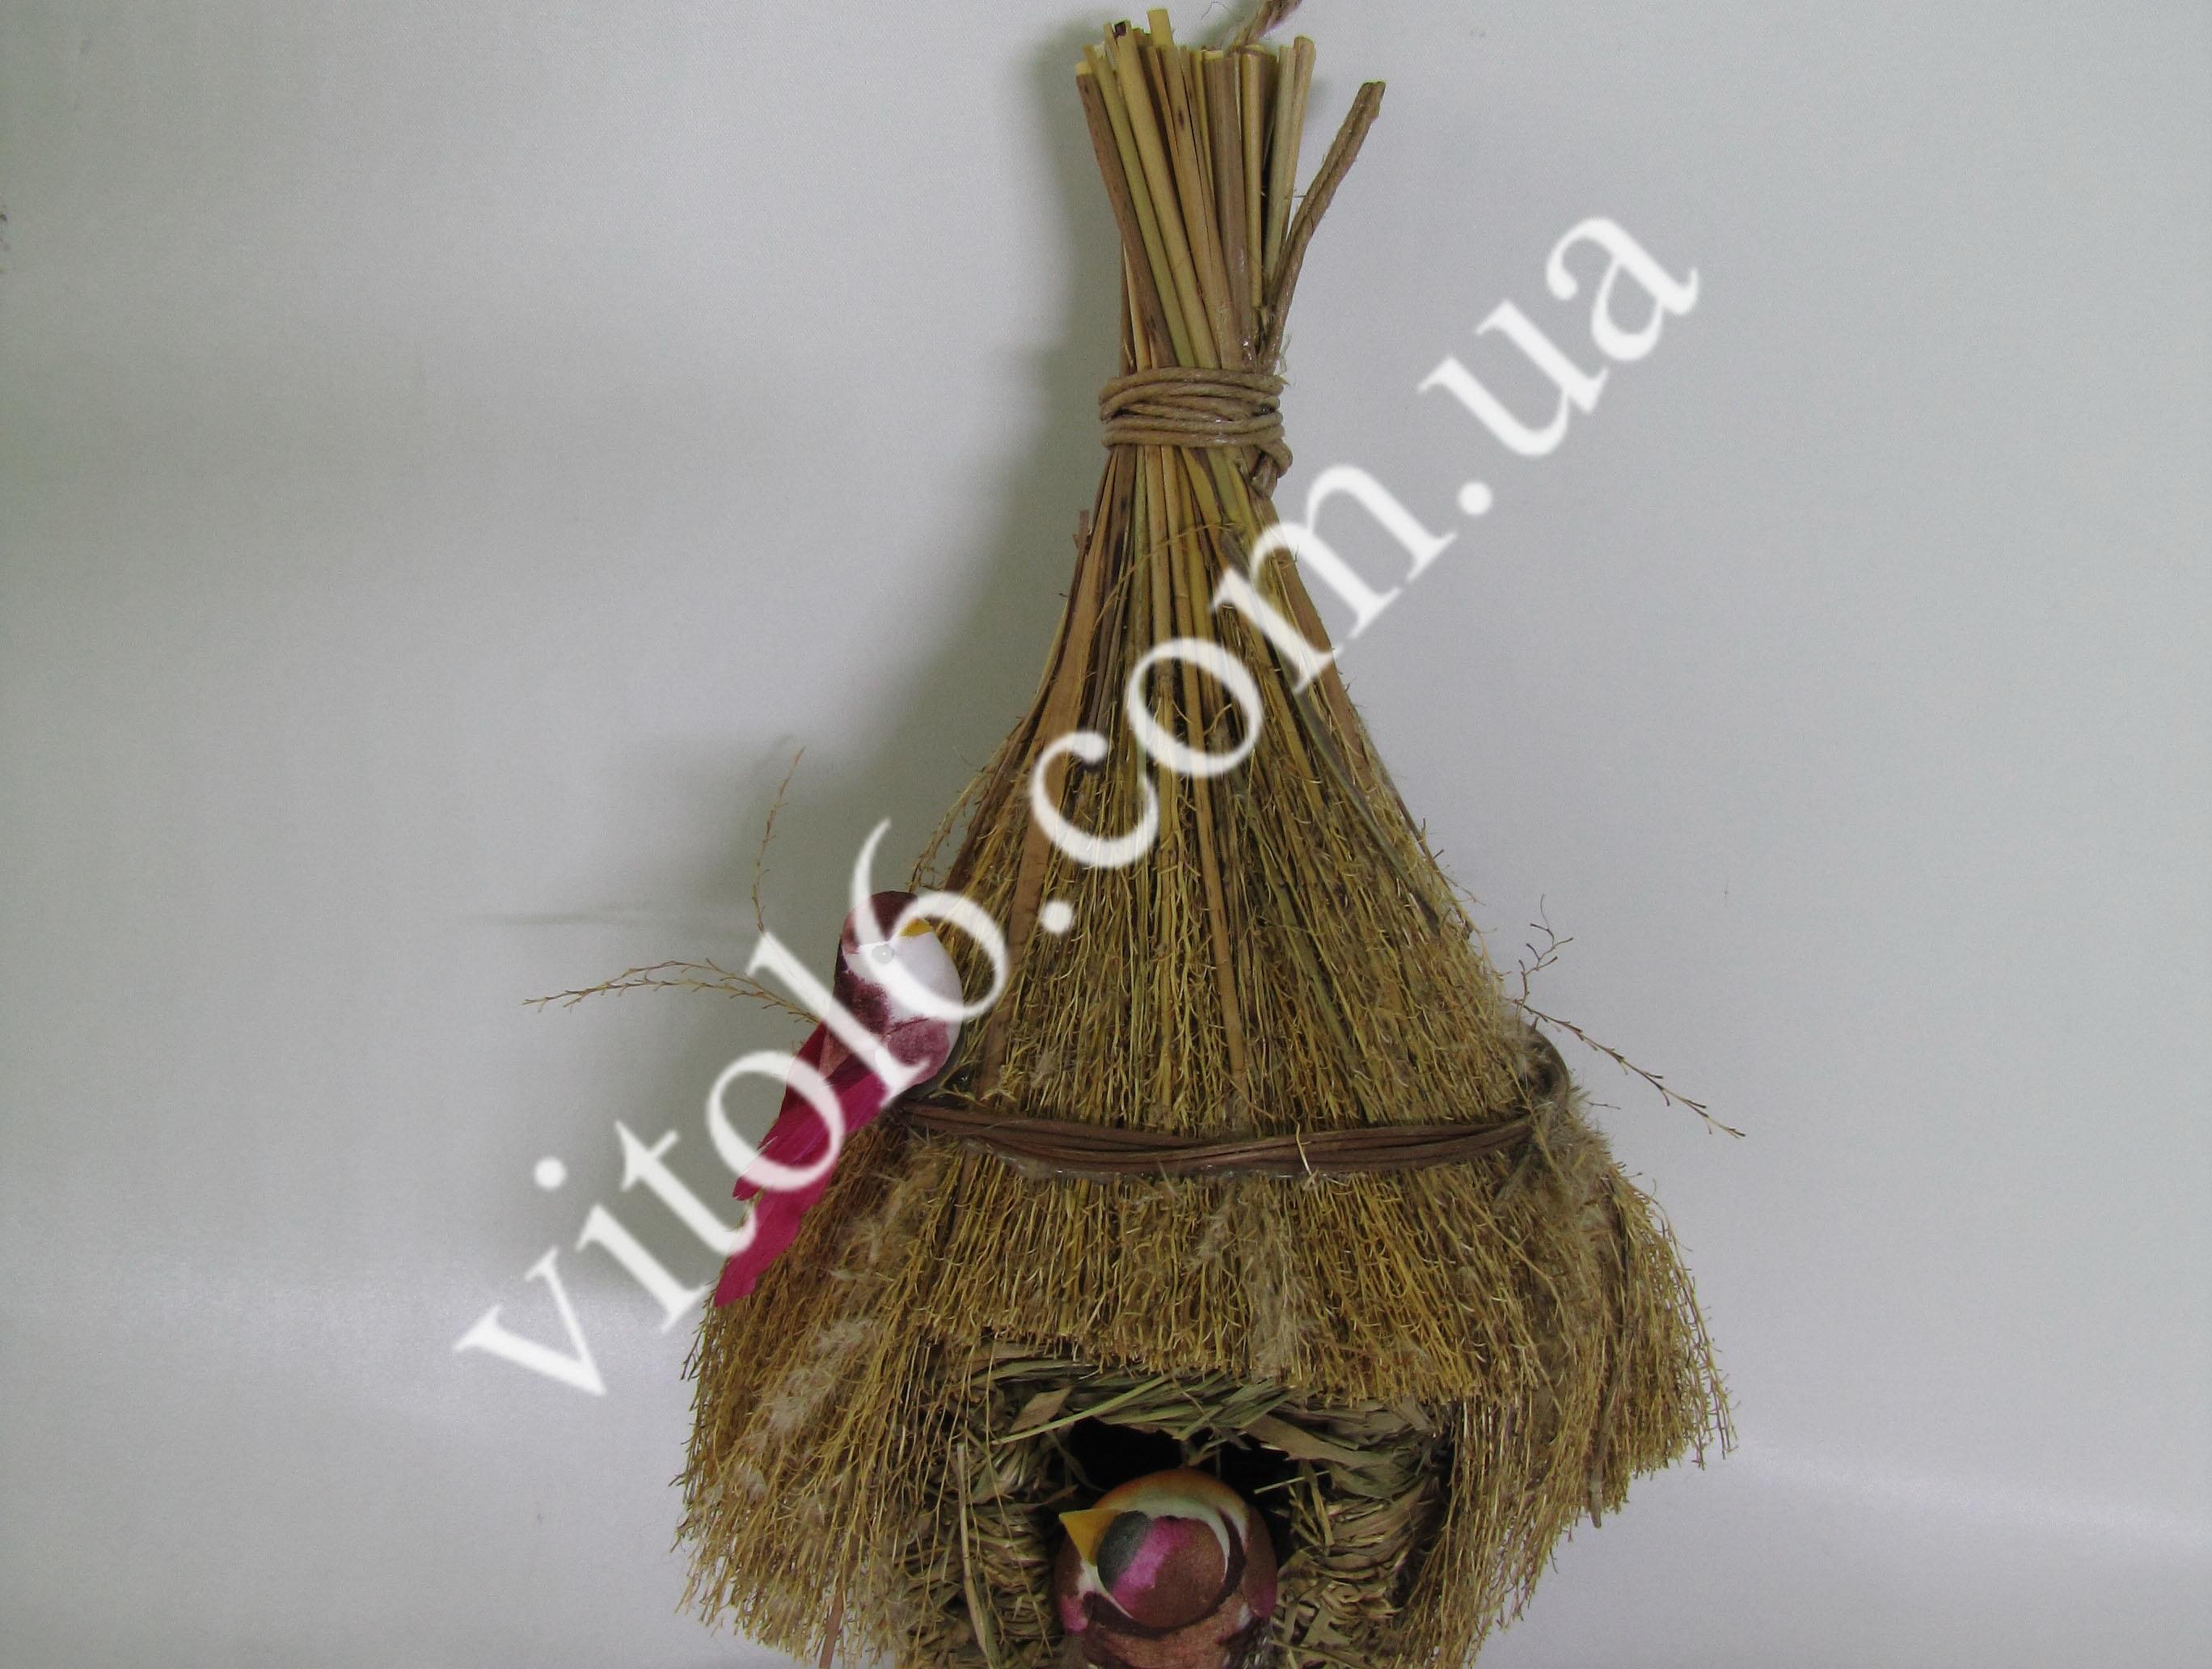 Гнездо (2-мя птицами) 25см VT6-13284(90шт)